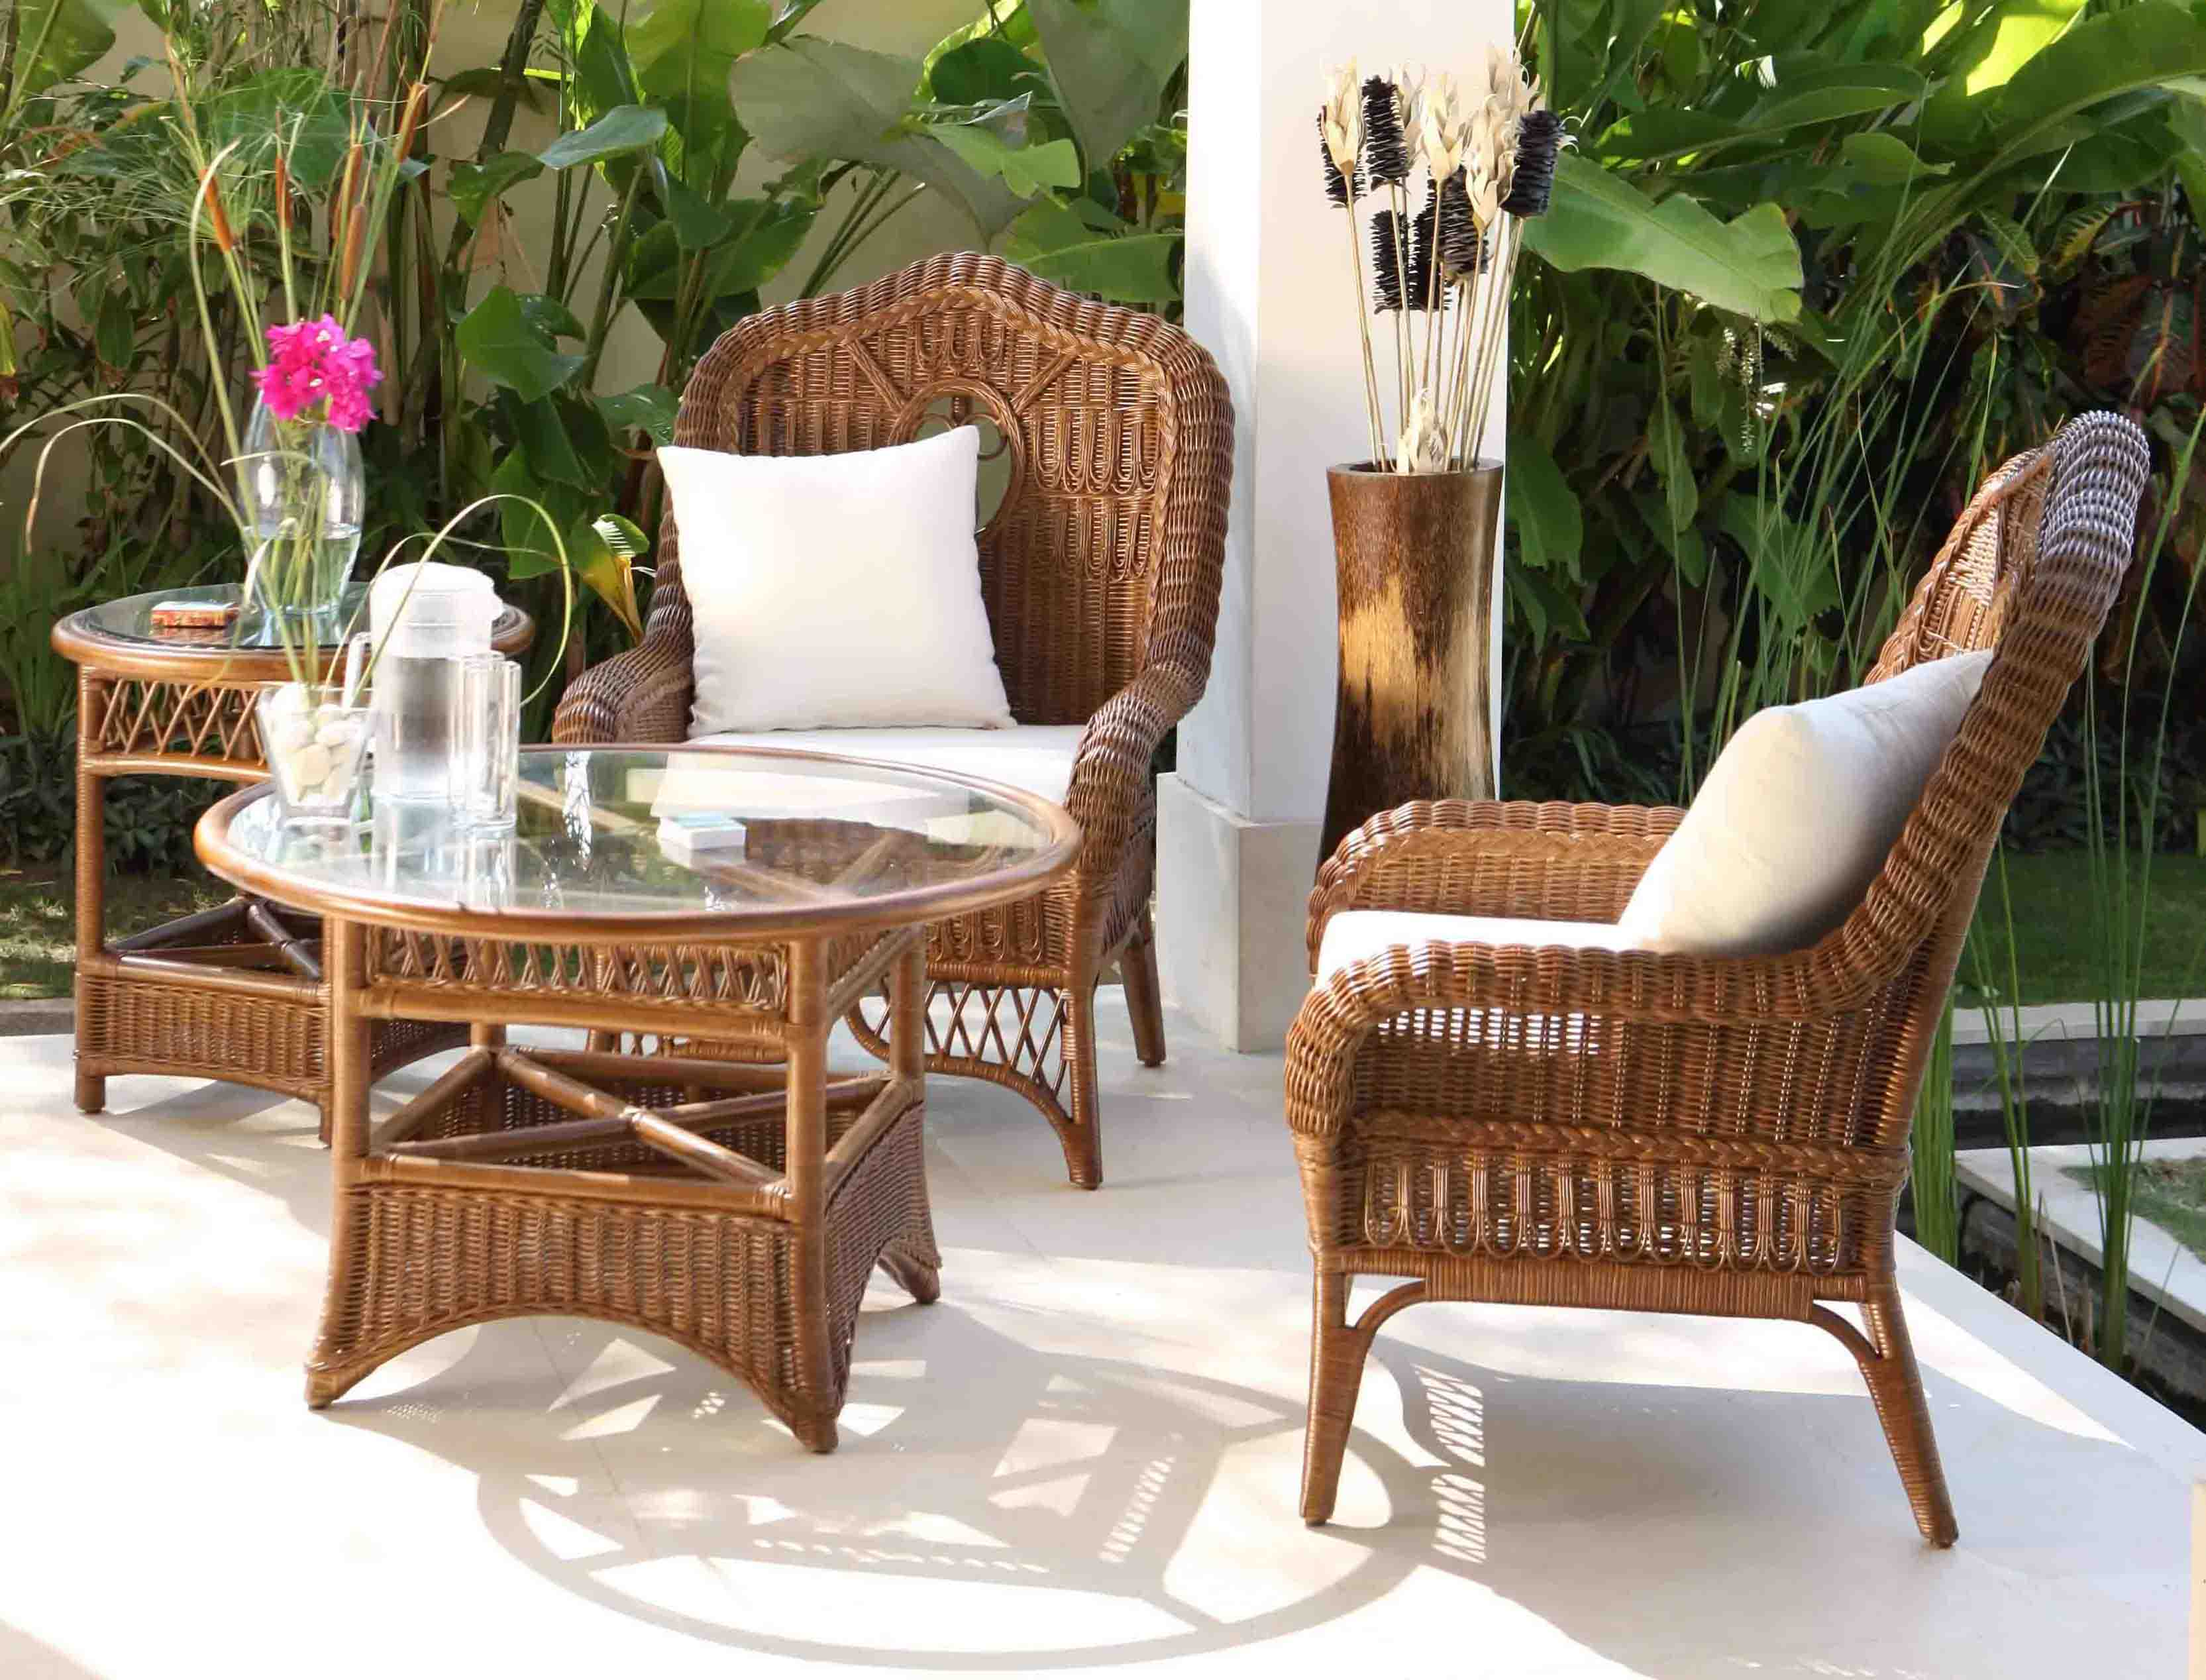 Raffles Victorica Clearance Kingsway Cane Furniture Ltd